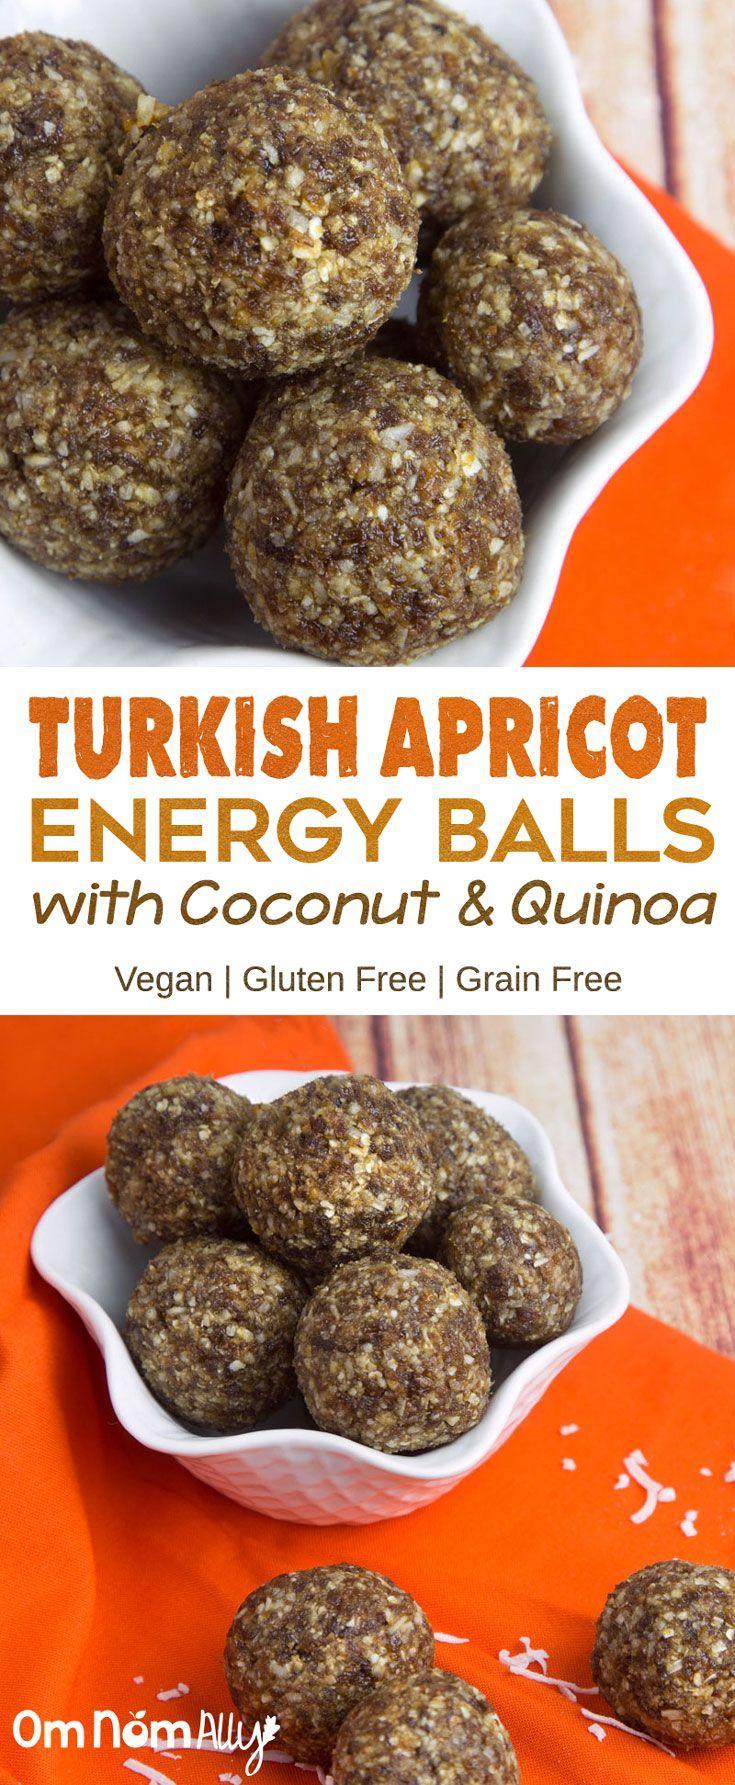 Turkish Apricot Energy Balls with Coconut & Quinoa - Vegan, High Fibre and Grain Free!